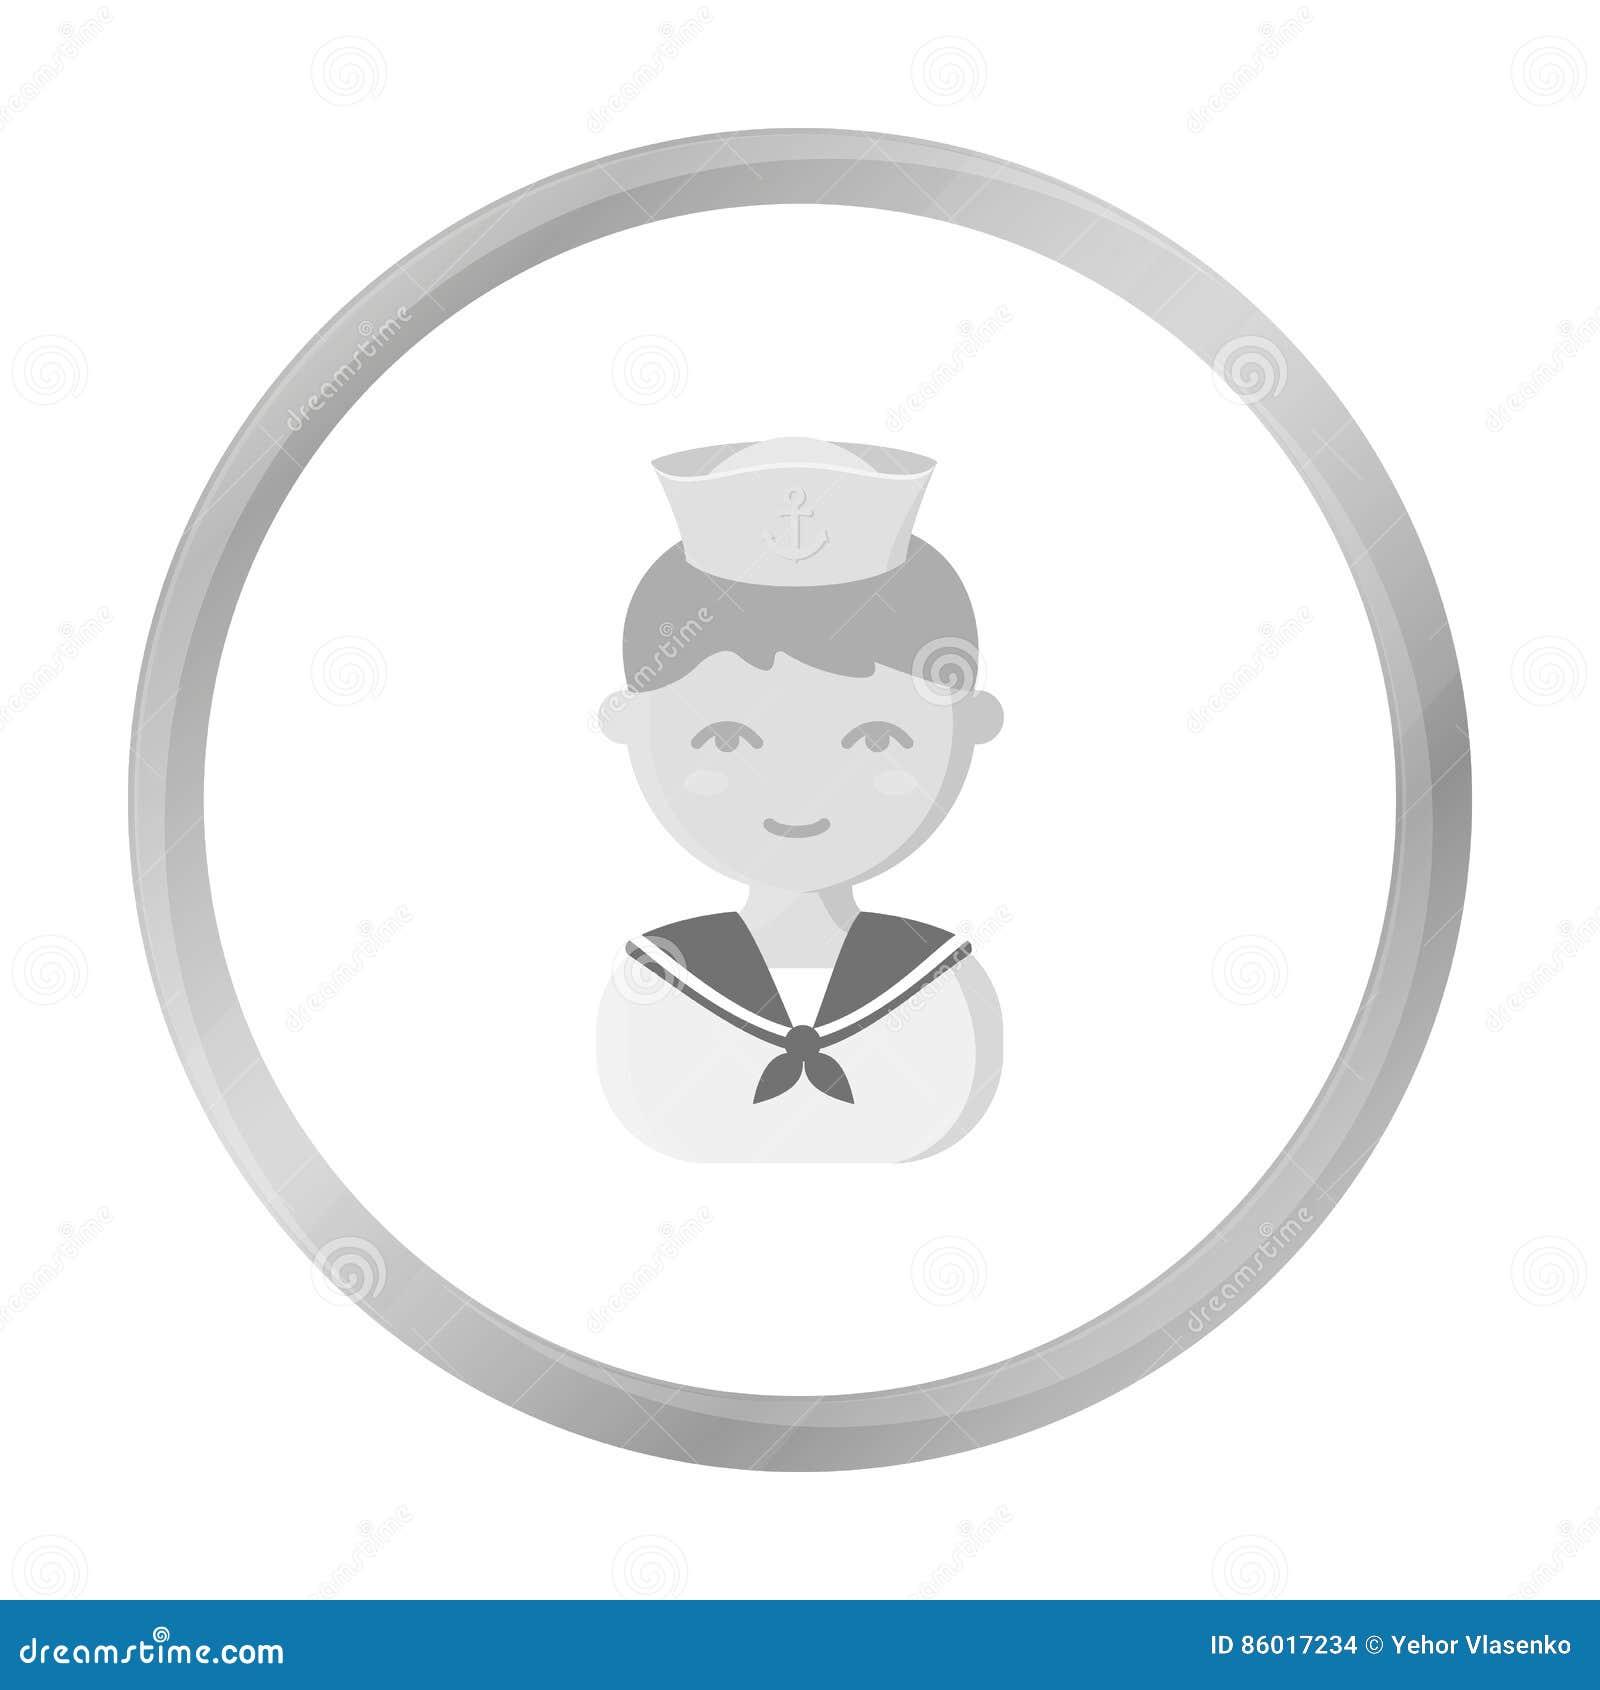 Sailor Monochrome Icon. Illustration For Web And Mobile ...